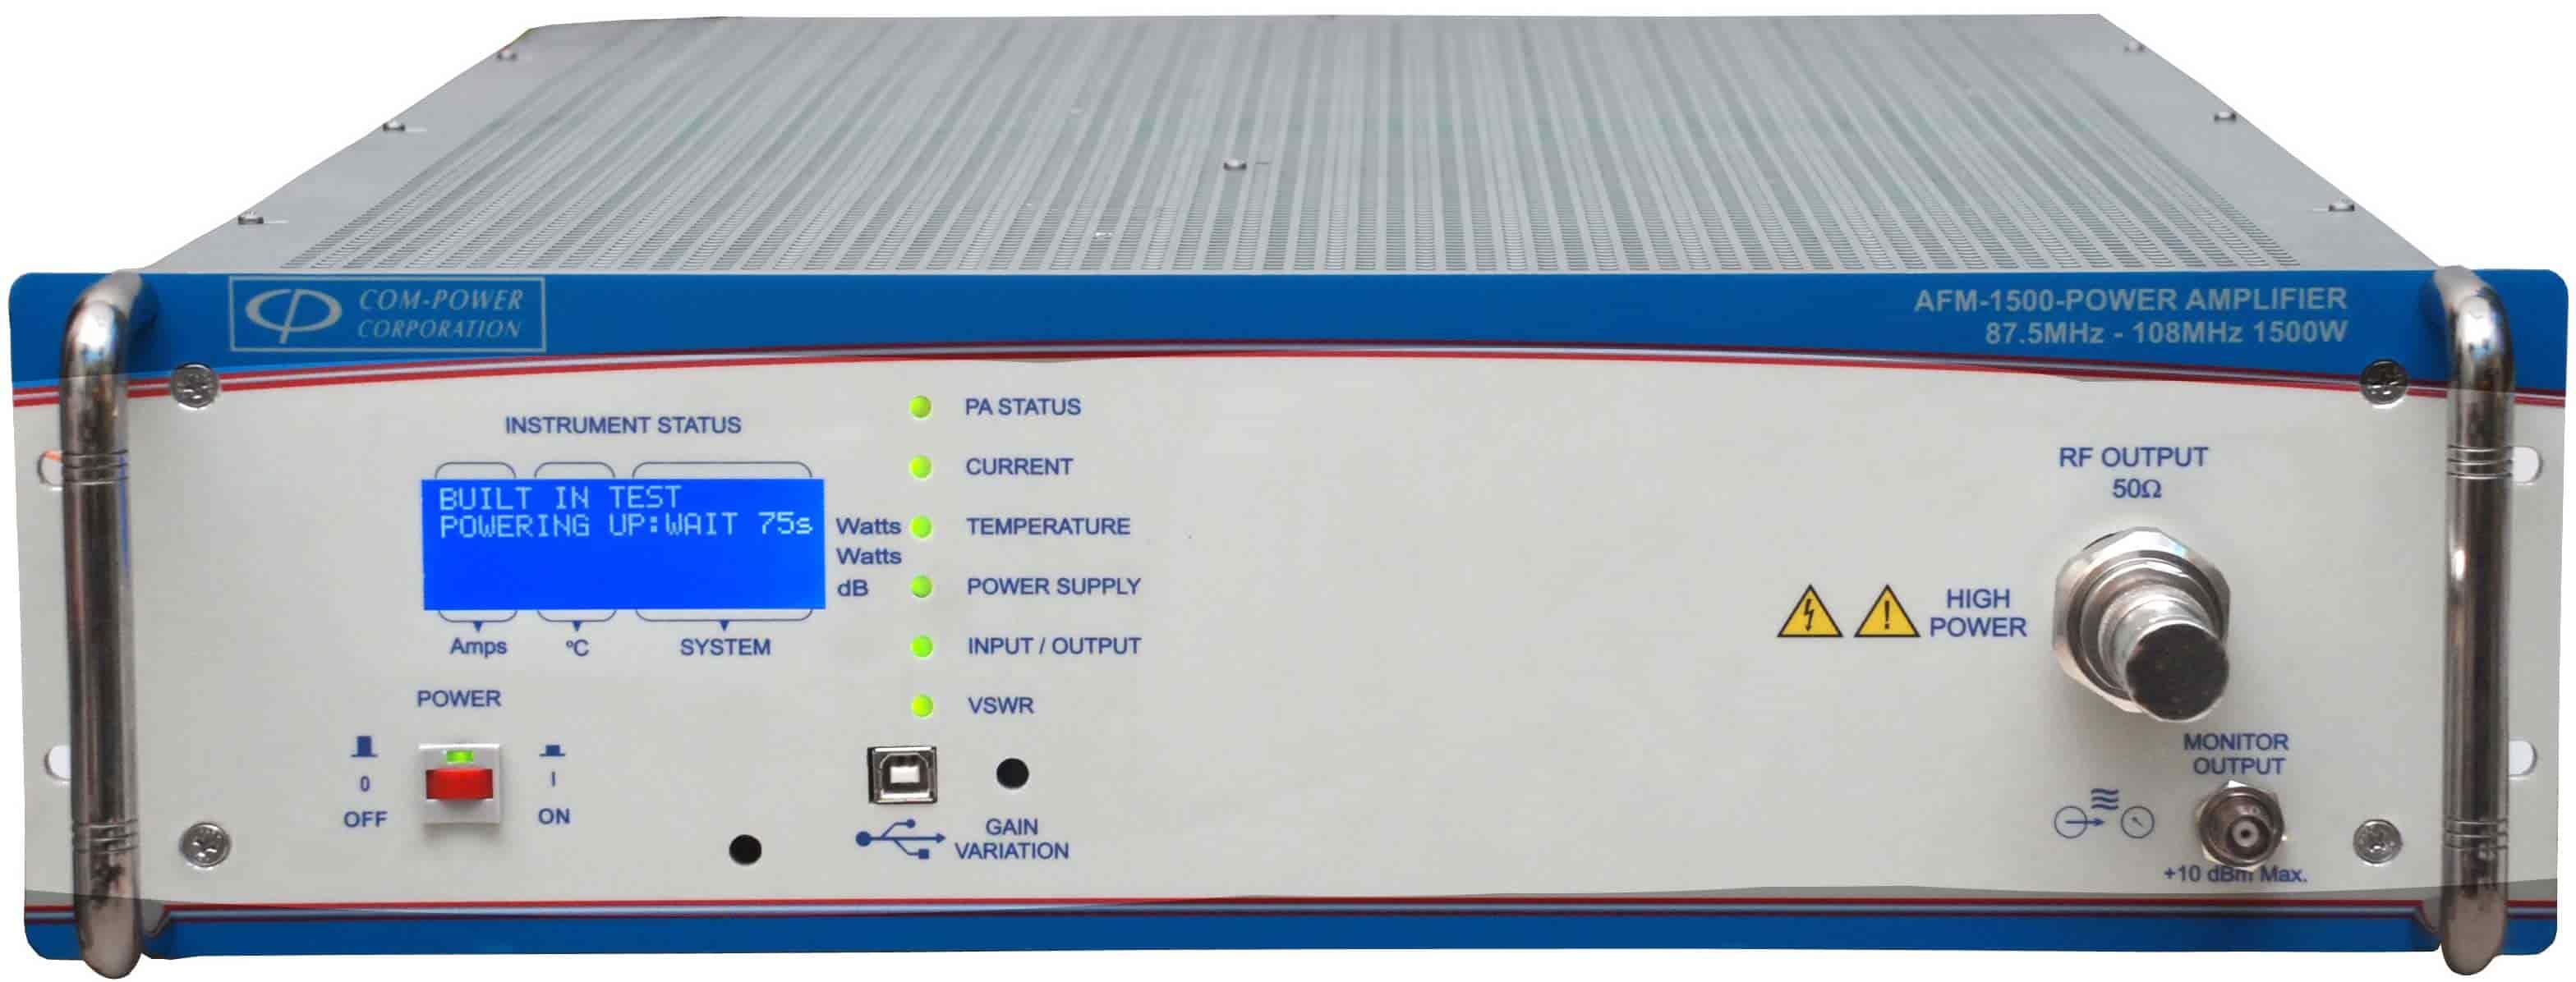 Power Amplifier For Fm Transmitters 1500 W 5 Watt A Part Of Com Powers Series Rf Amplifiers